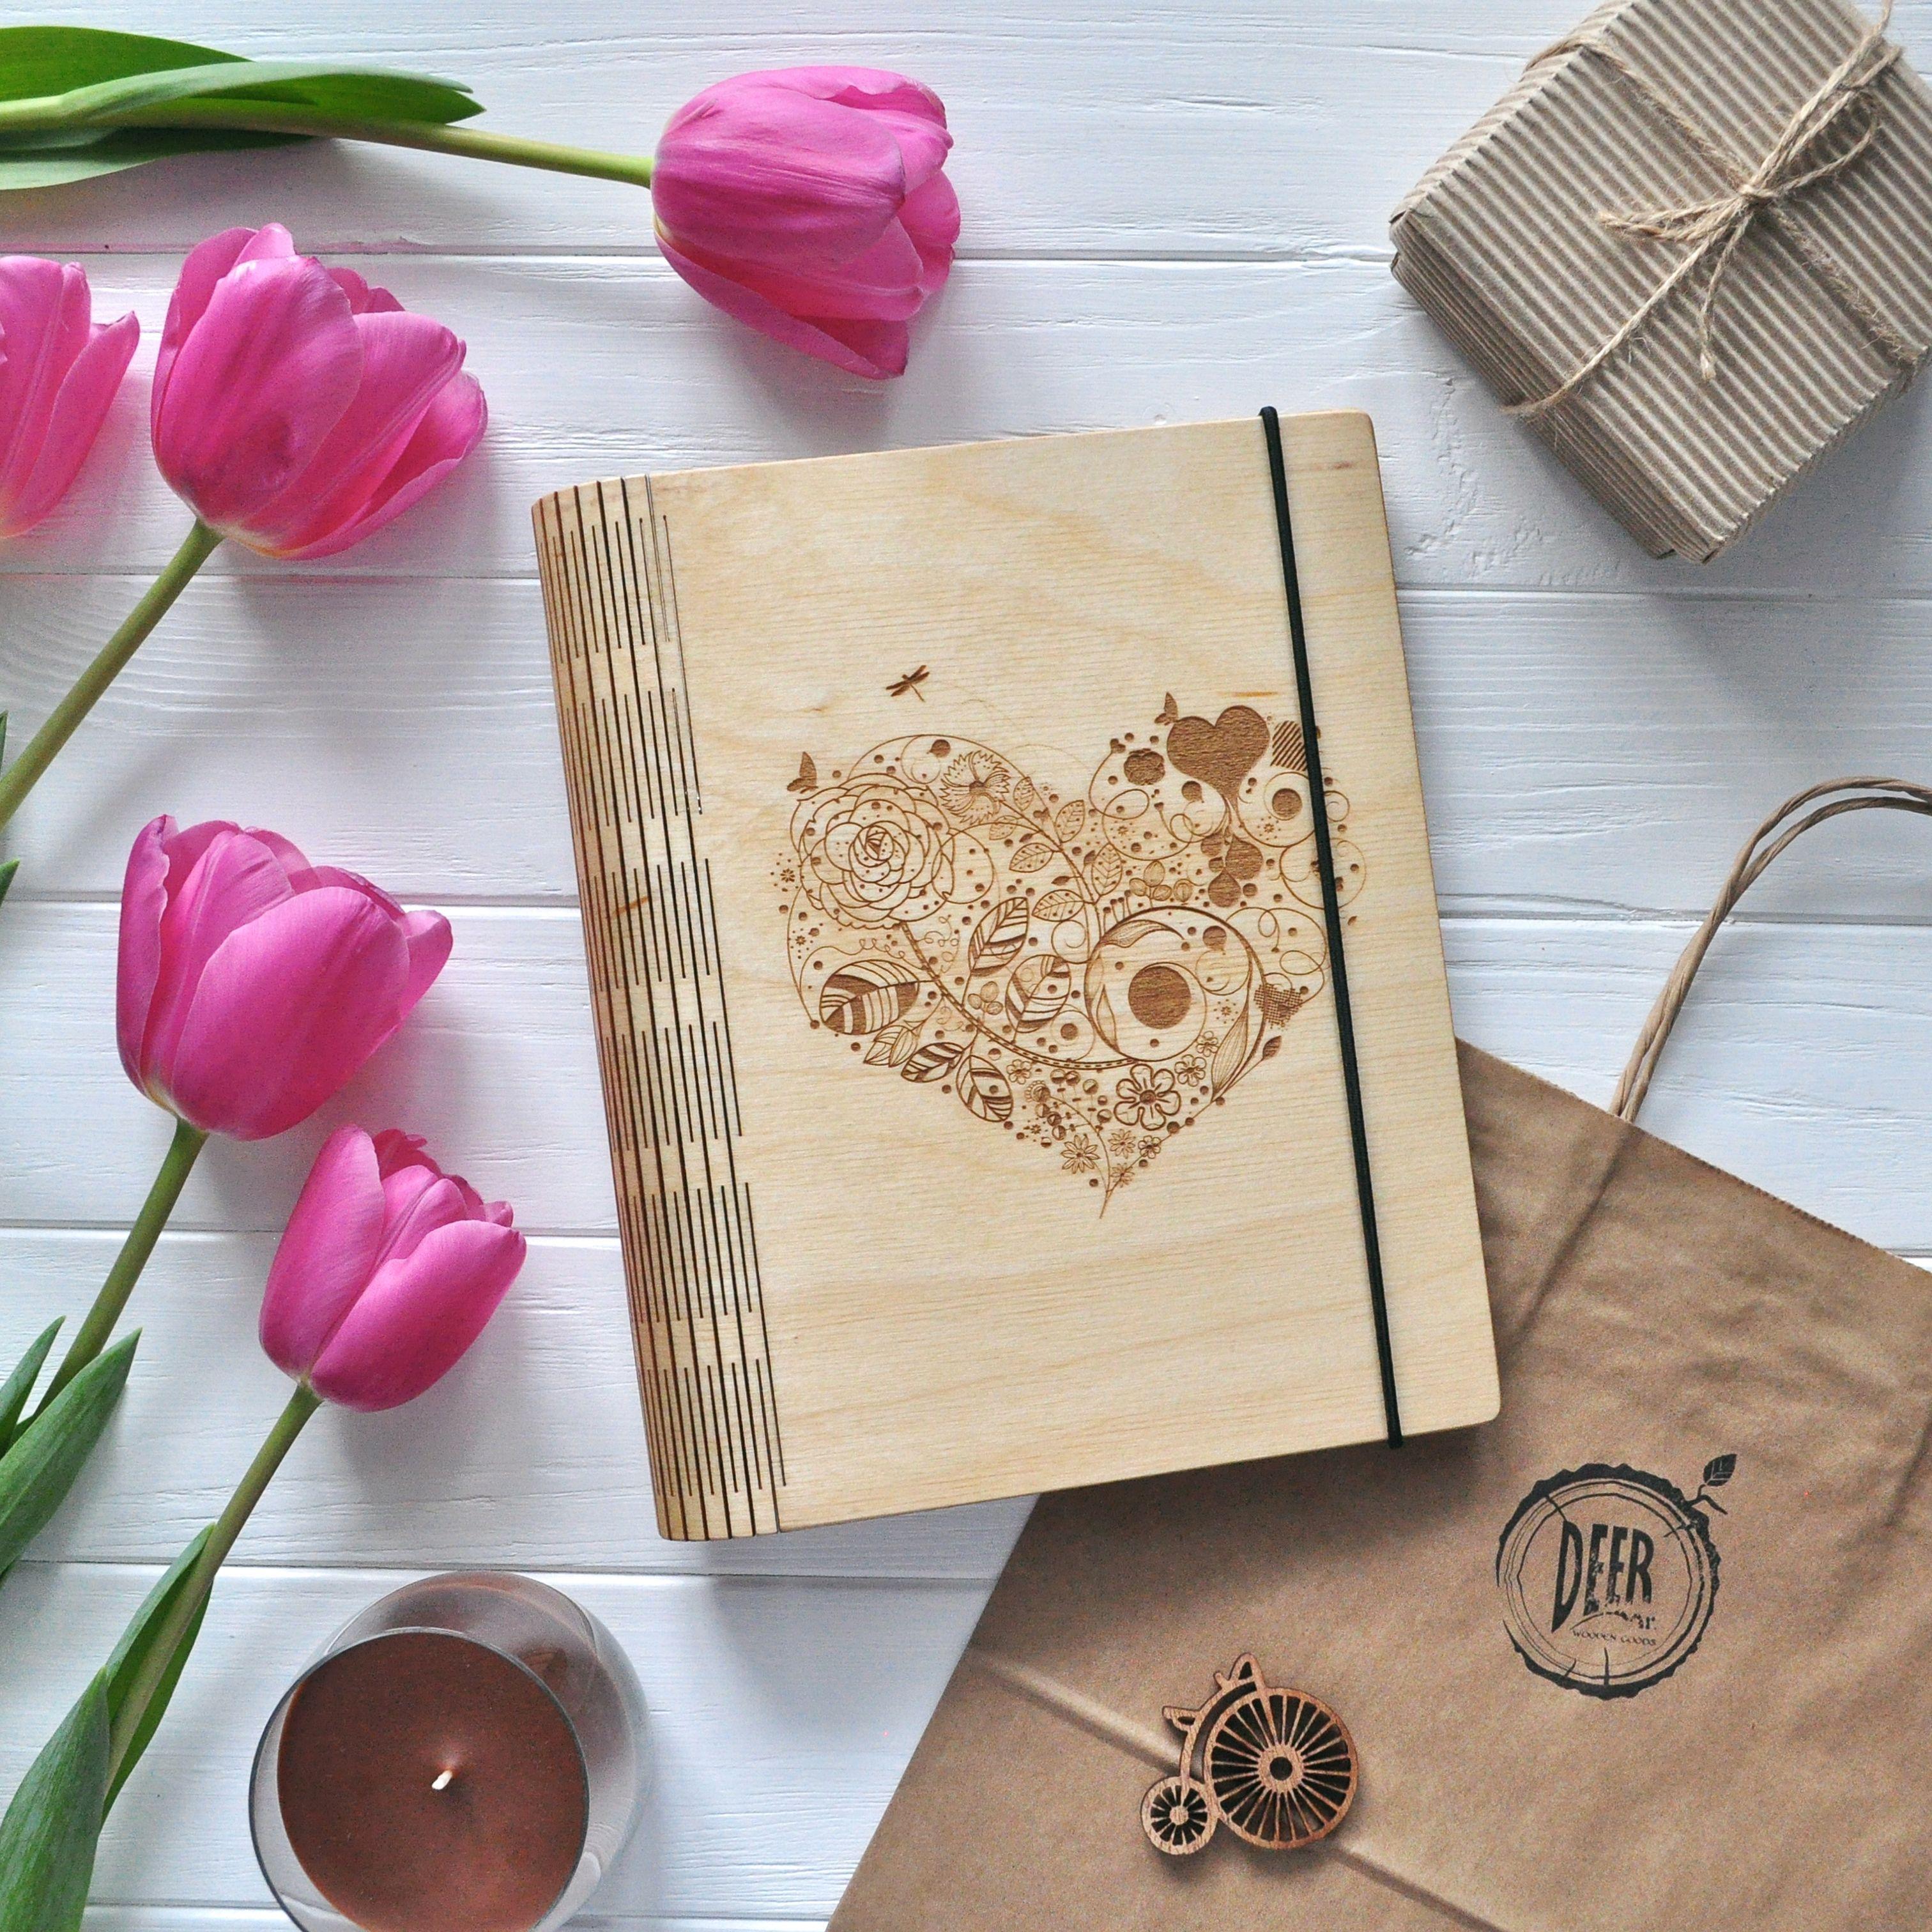 widescreen diy wedding journal of mobile phones hd pics heart wooden notebook binder blank wood guestbook custom